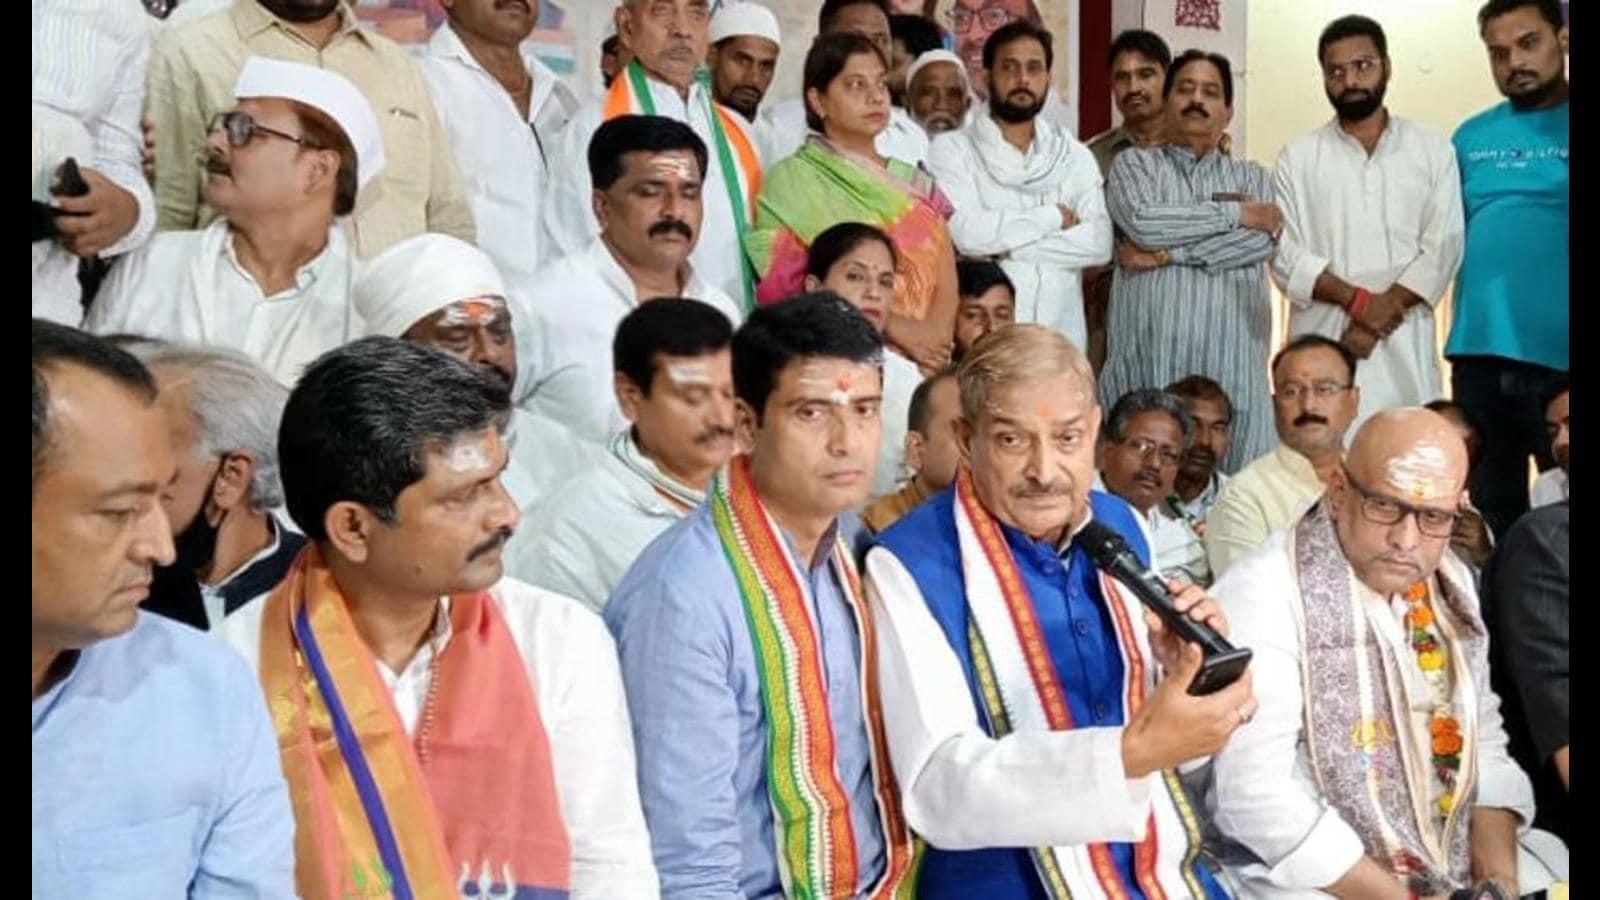 Pratigya Yatra: Congress fighting second freedom struggle to protect country, says Pramod Tiwari